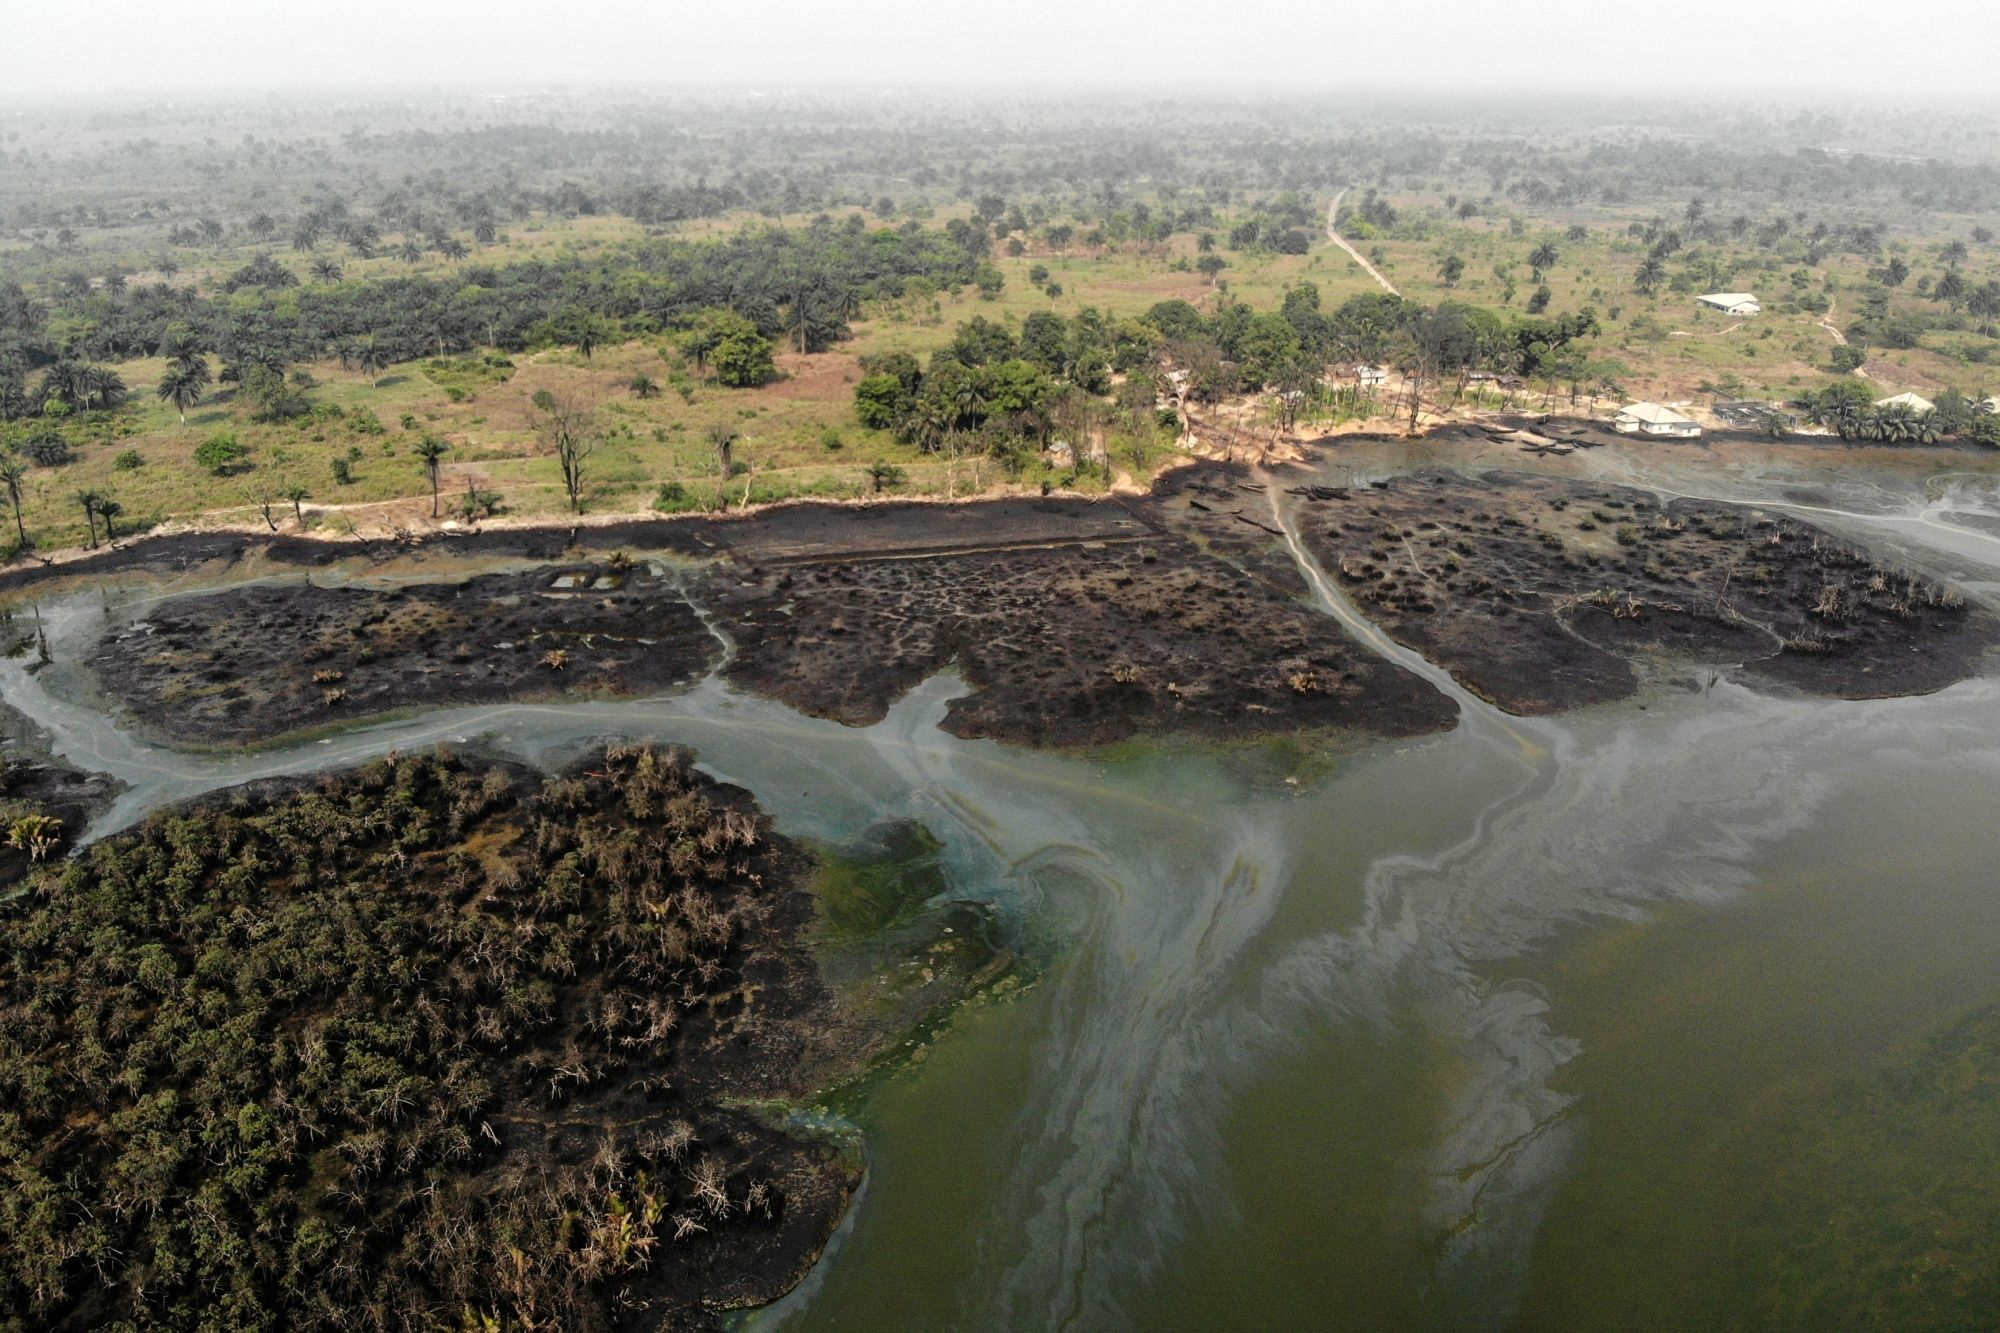 Nigerias Environmental Distress